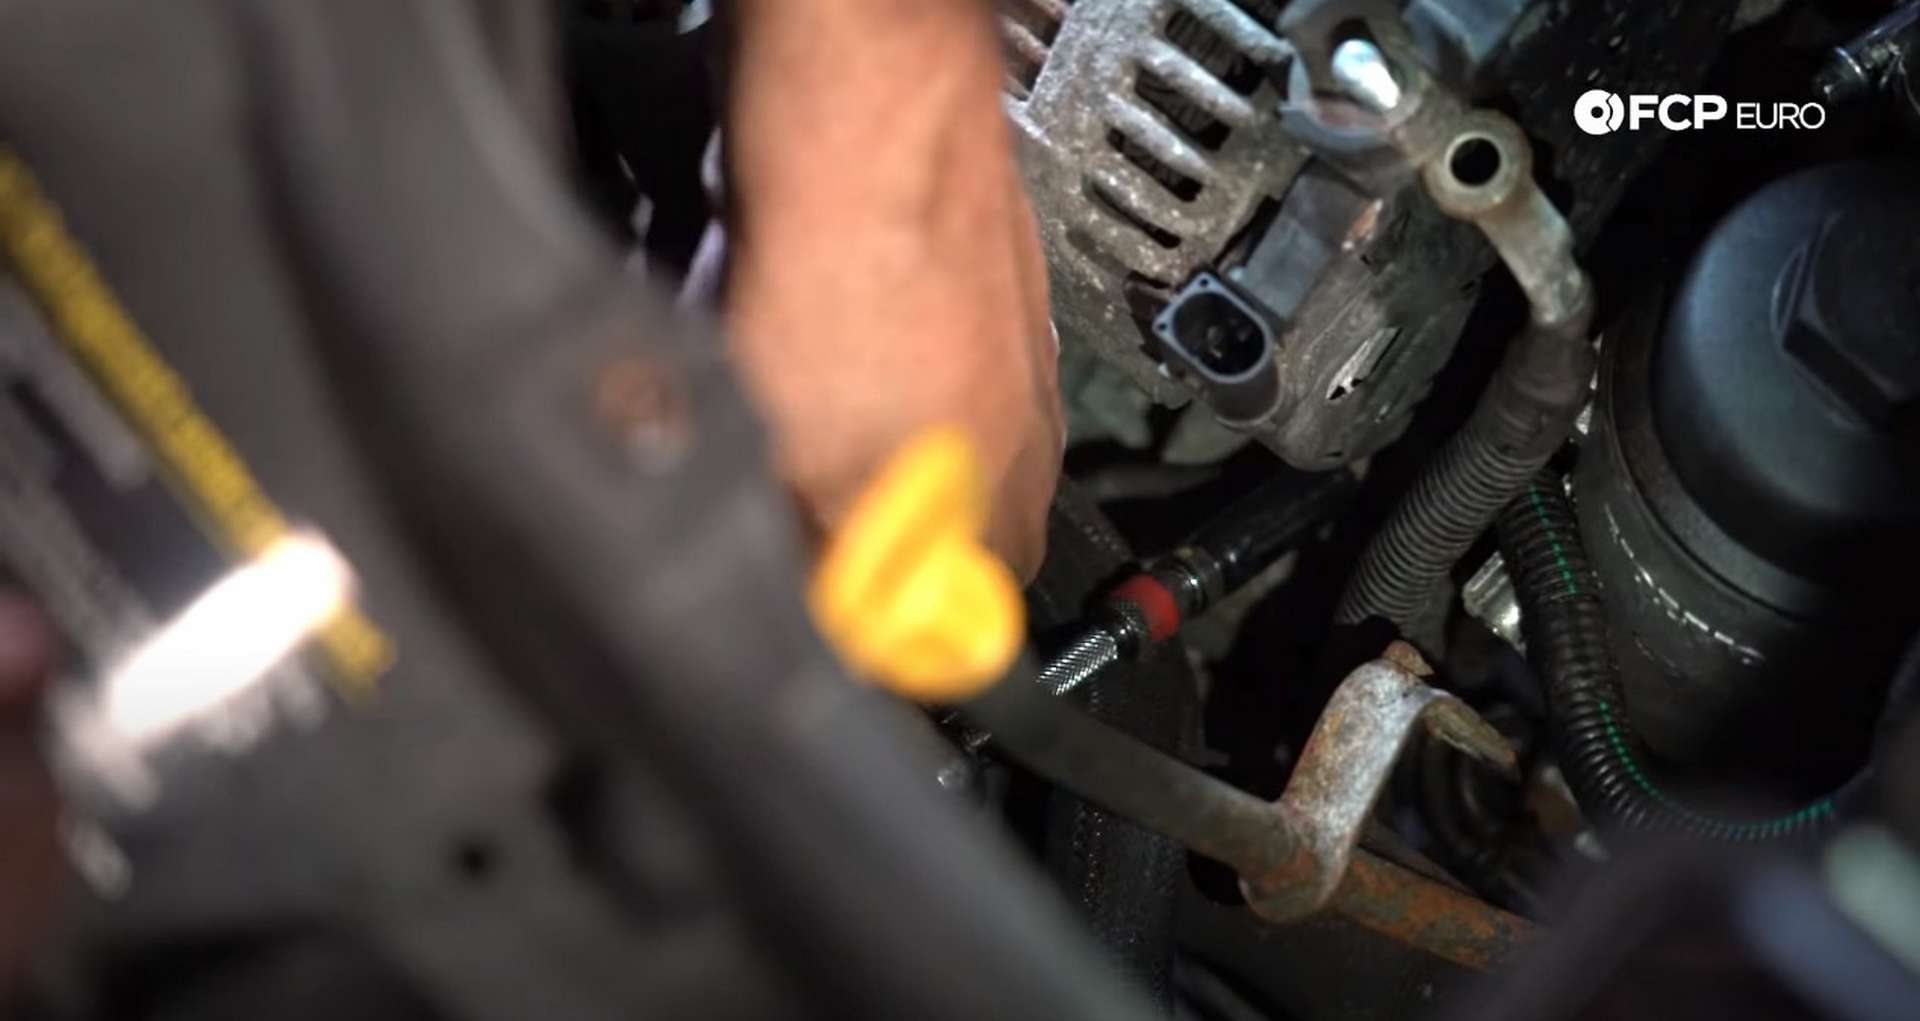 DIY Volvo Alternator and Serpentine Belt Replacement removing the bottom alternator mounting bolt